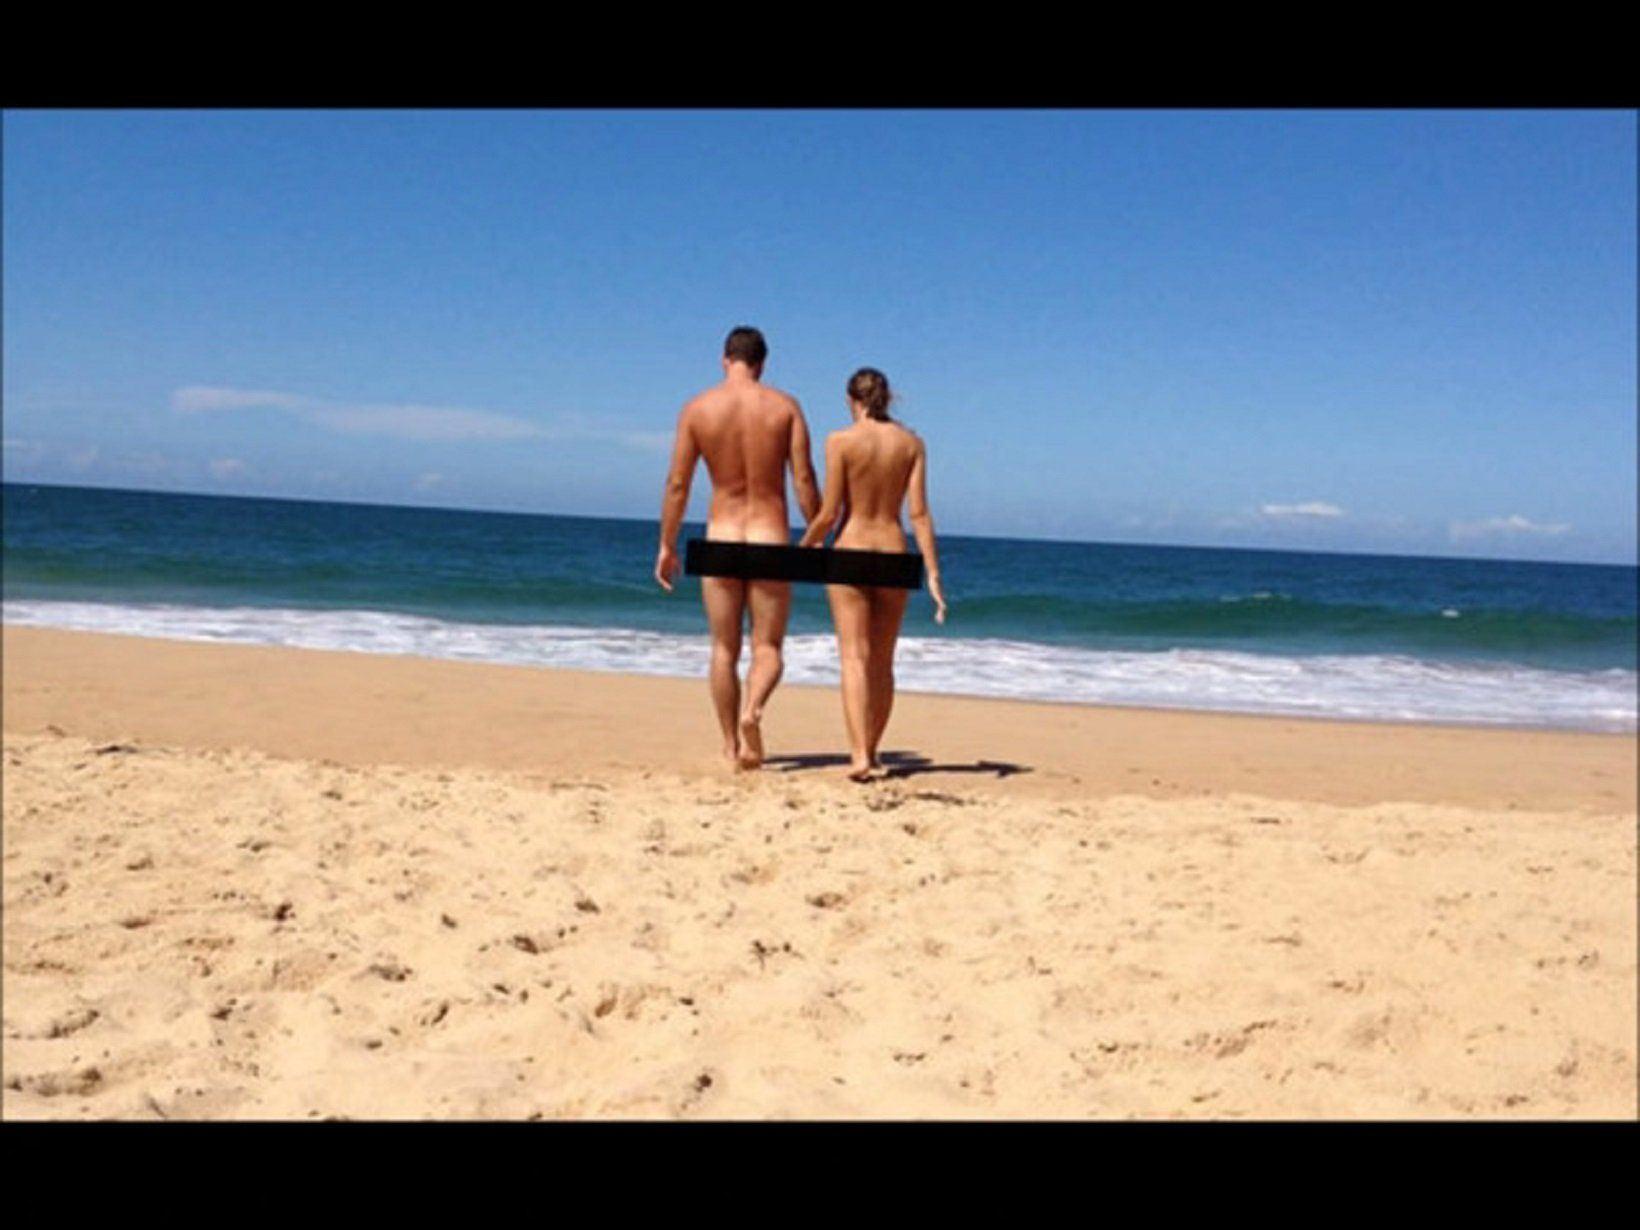 Nude movie scenes blogspot